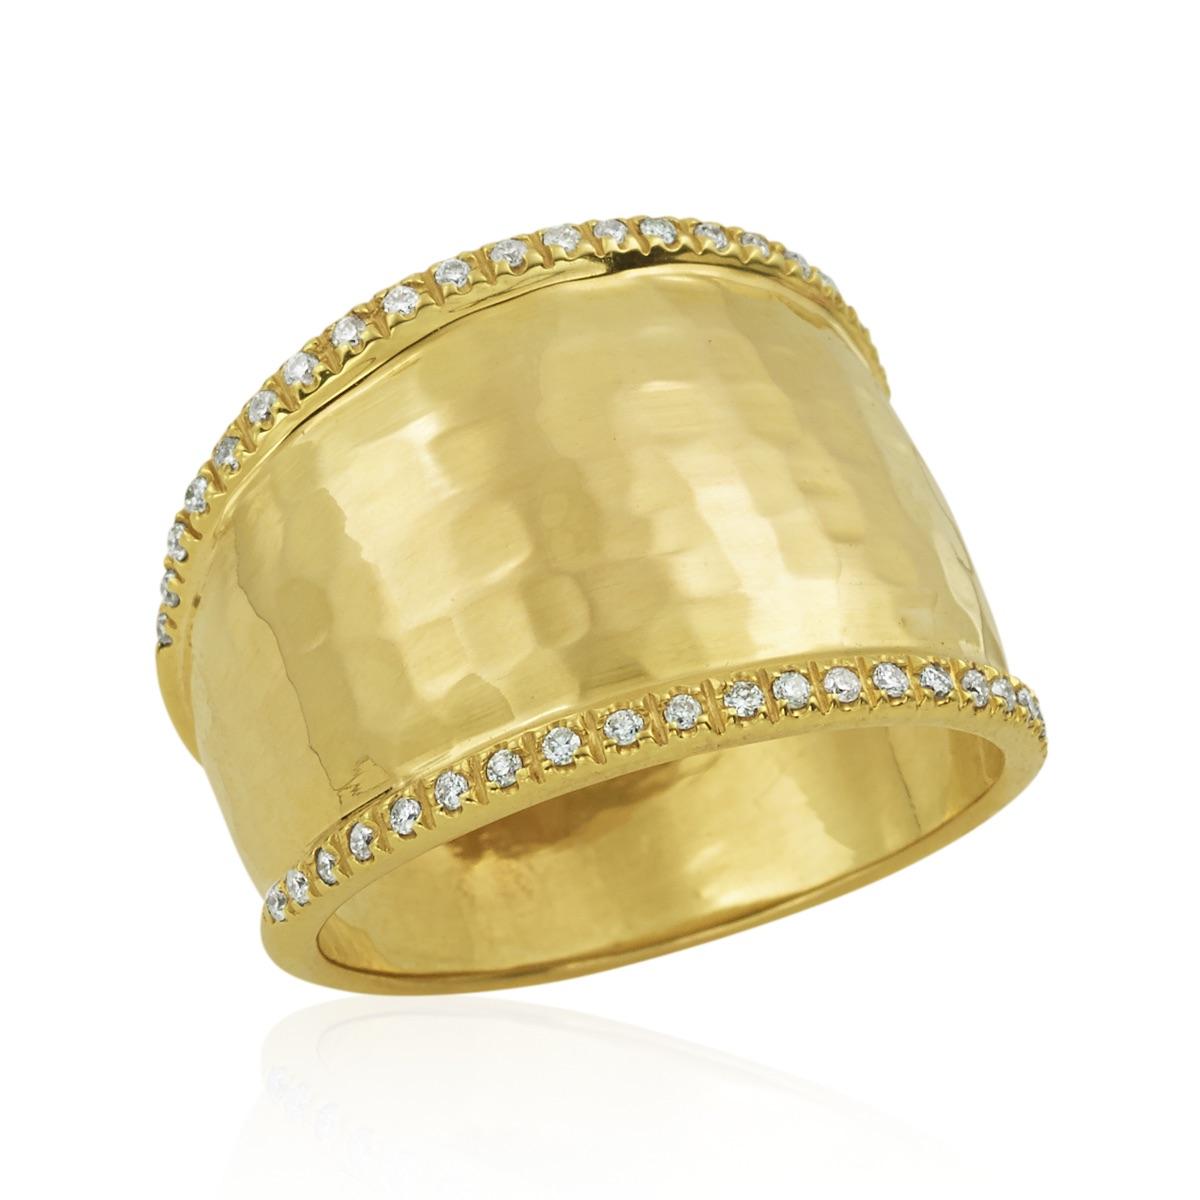 The Jewel - Mazza - Lookbook - Gold Ring